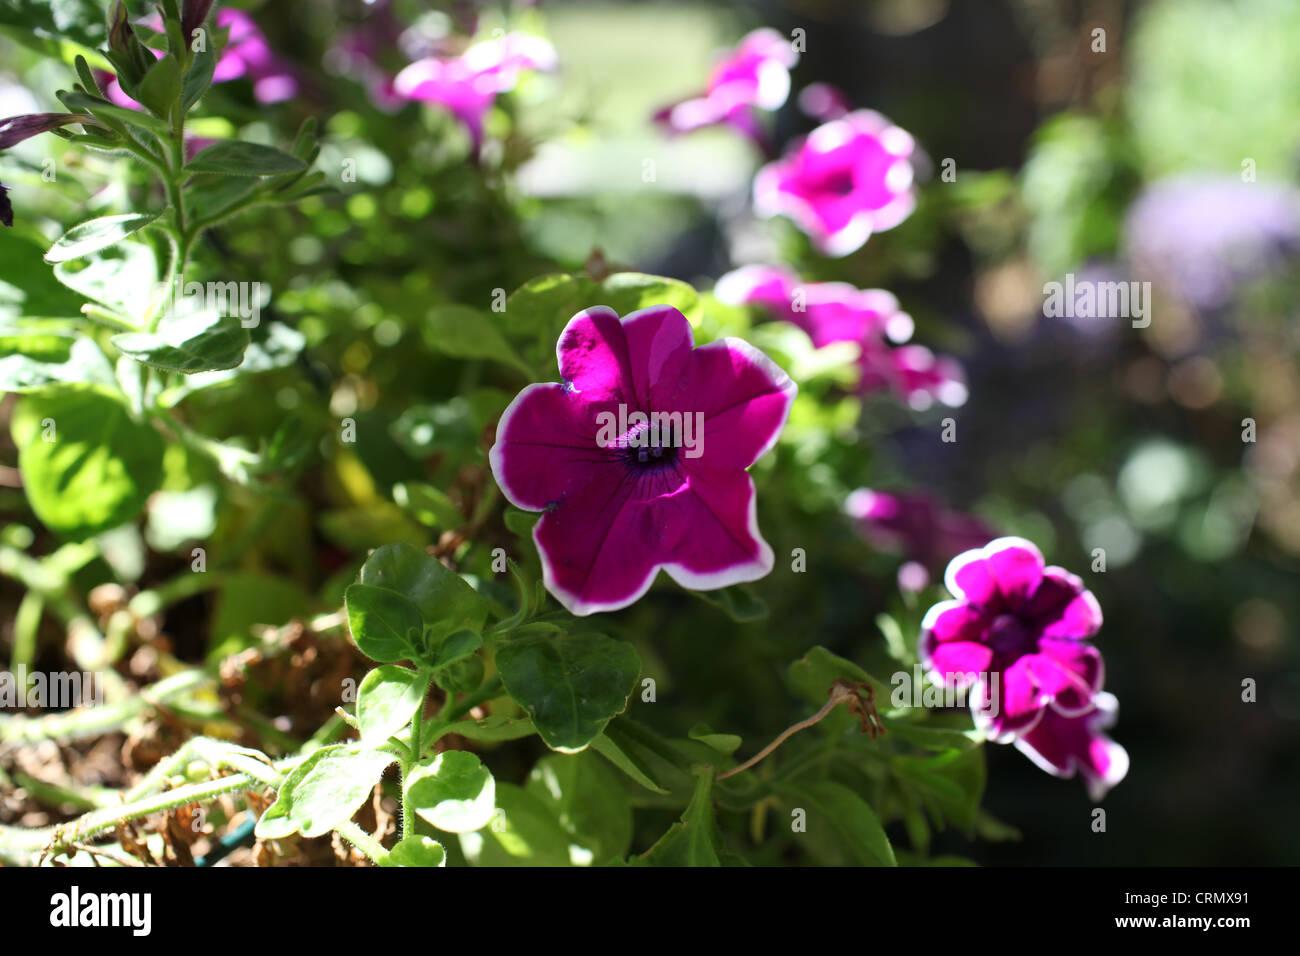 Purple flowers at orchid gardens jardines de orquideas for Jardines de orquideas